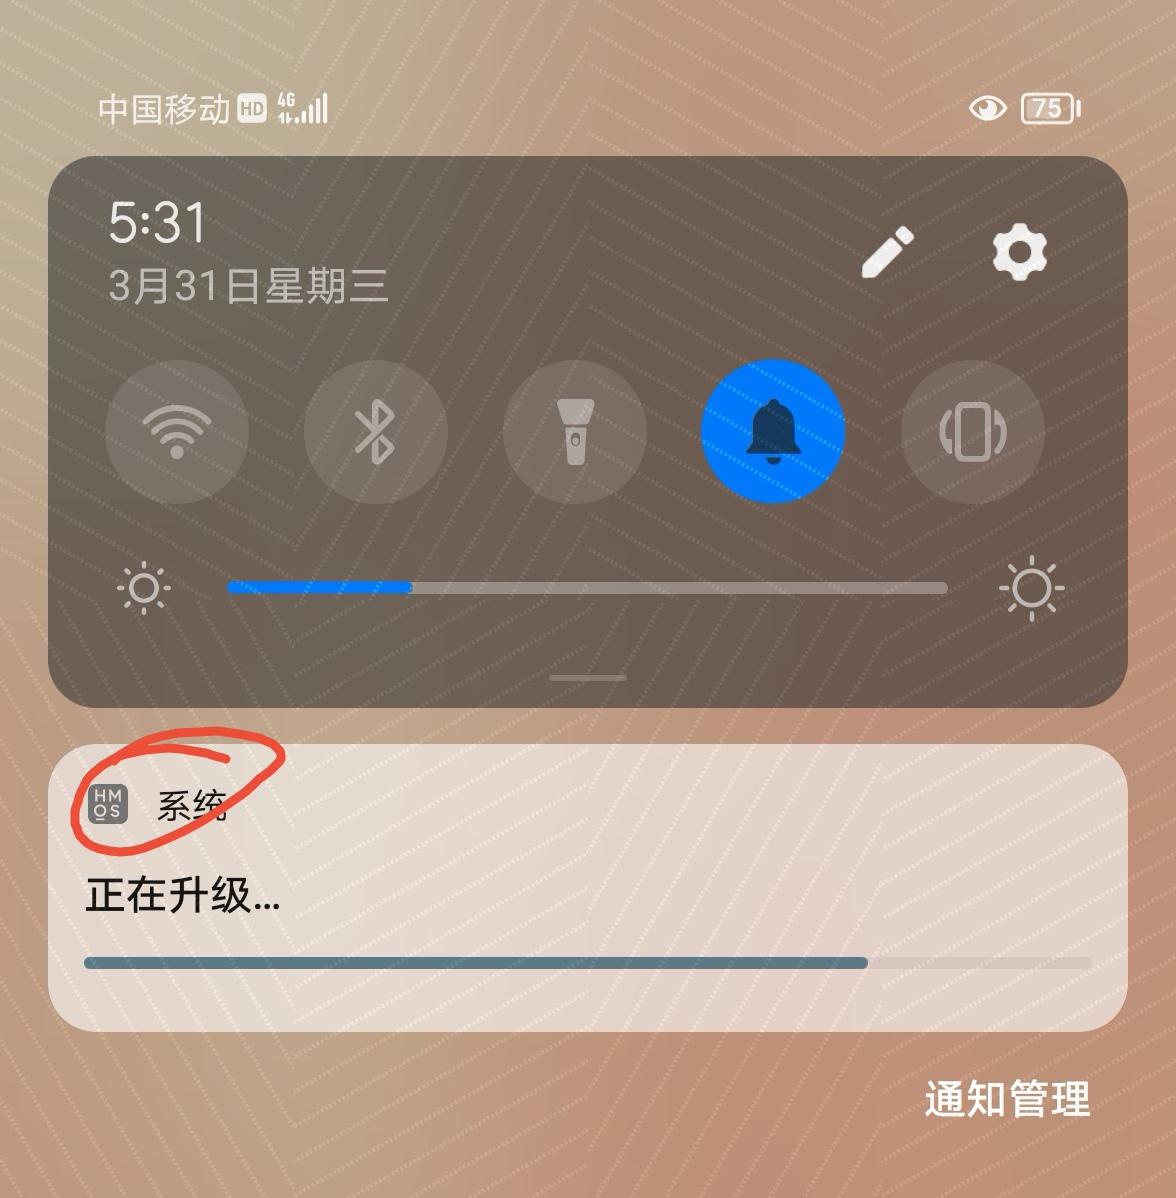 Screenshot_20210331_173133_com.huawei.android.launcher_edit_3080522971404.jpg